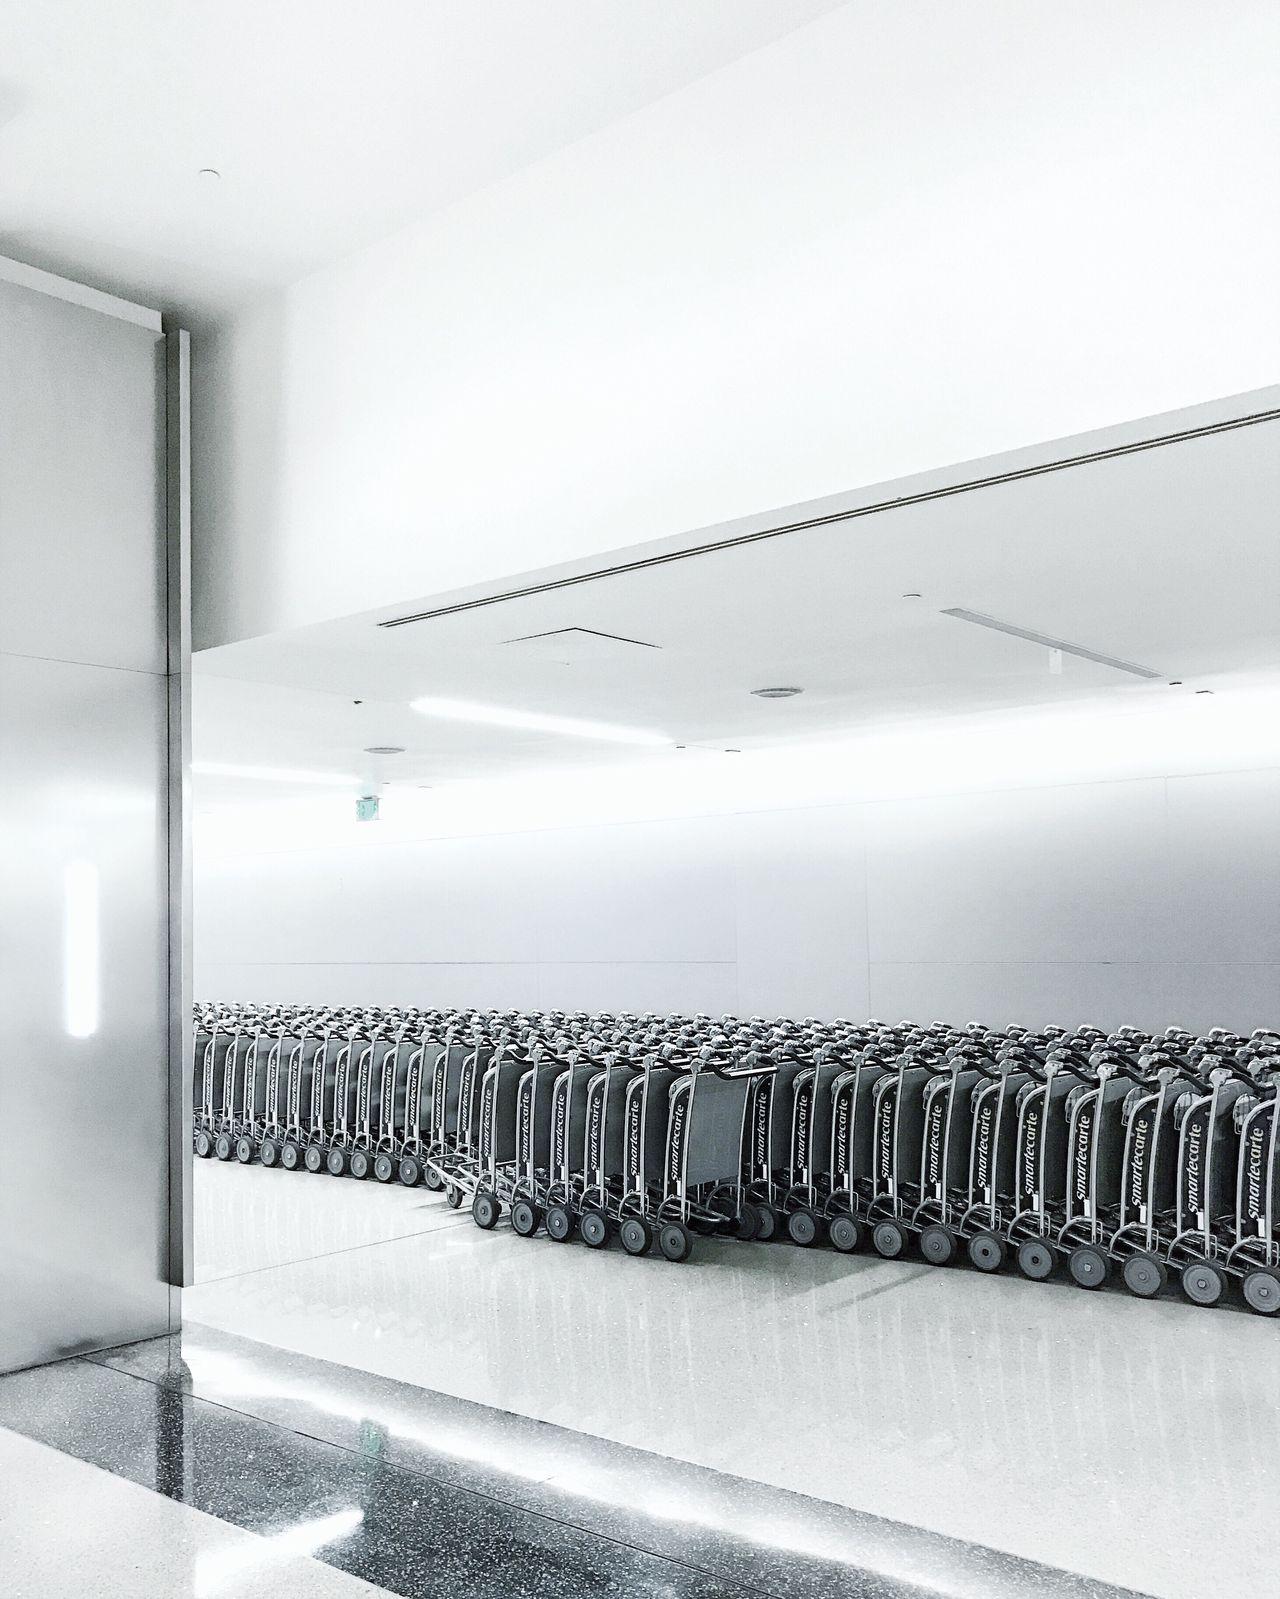 Carts indoors lax airport LAX cart minimal minimalism indoor